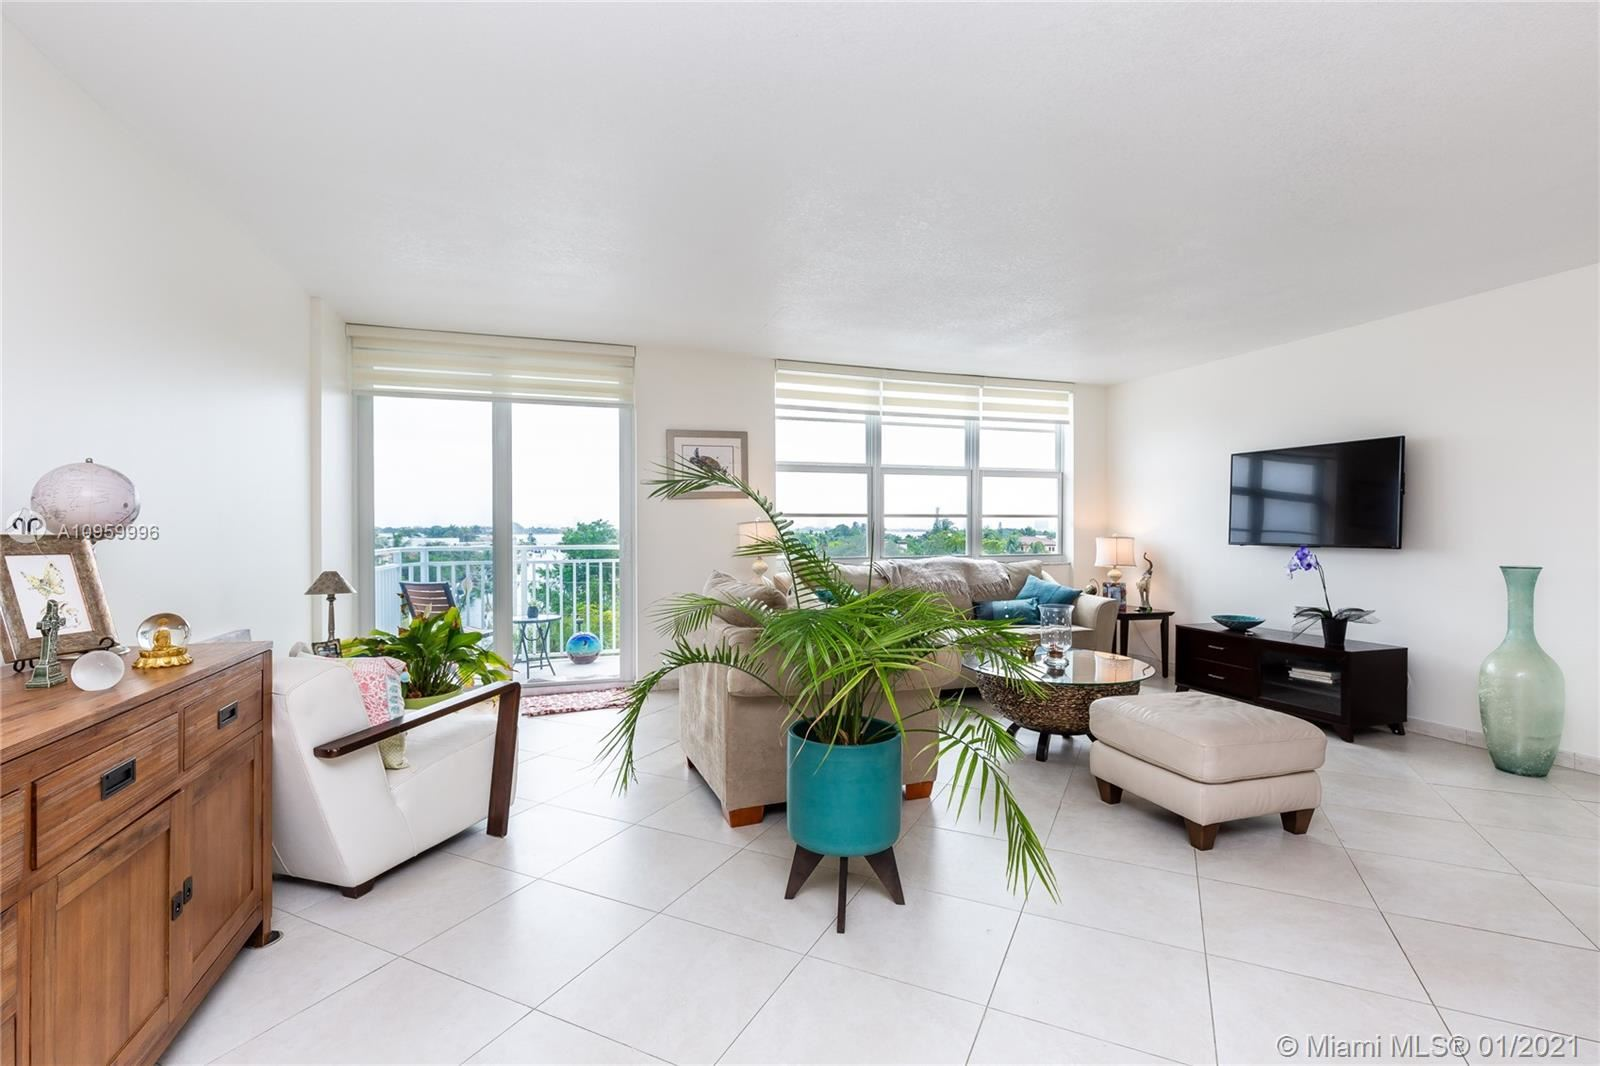 Photo of 2100 Sans Souci Blvd #C402, North Miami, FL 33181 (MLS # A10959996)